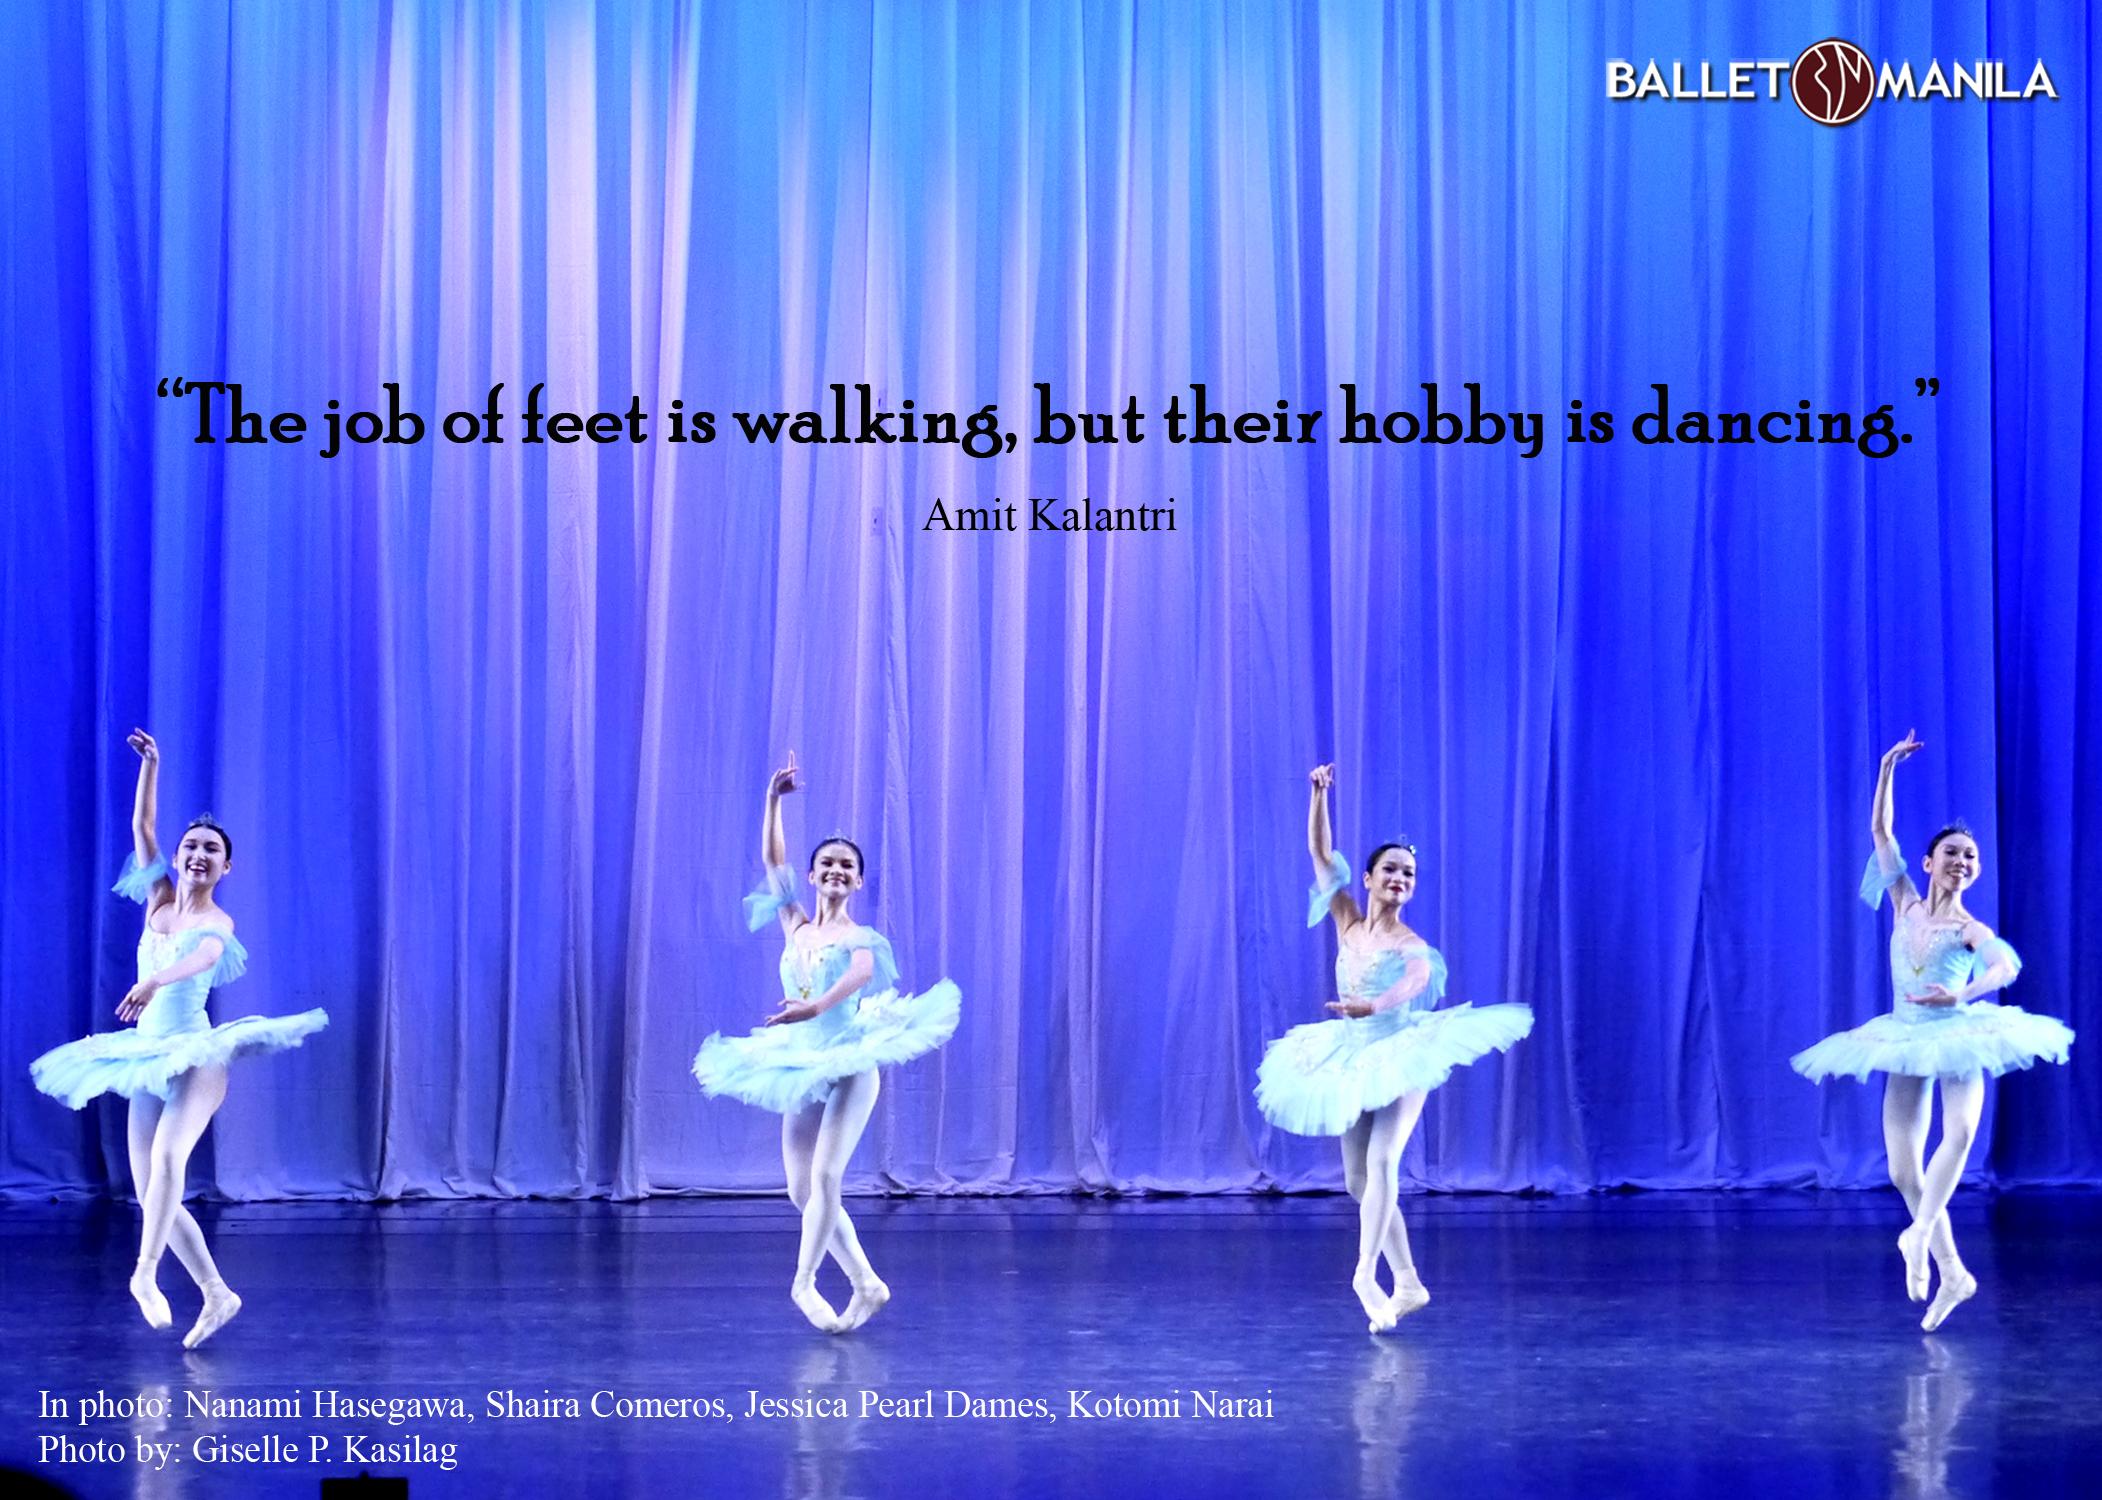 Talk about dance: Amit Kalantri 1 - Ballet Manila Archives